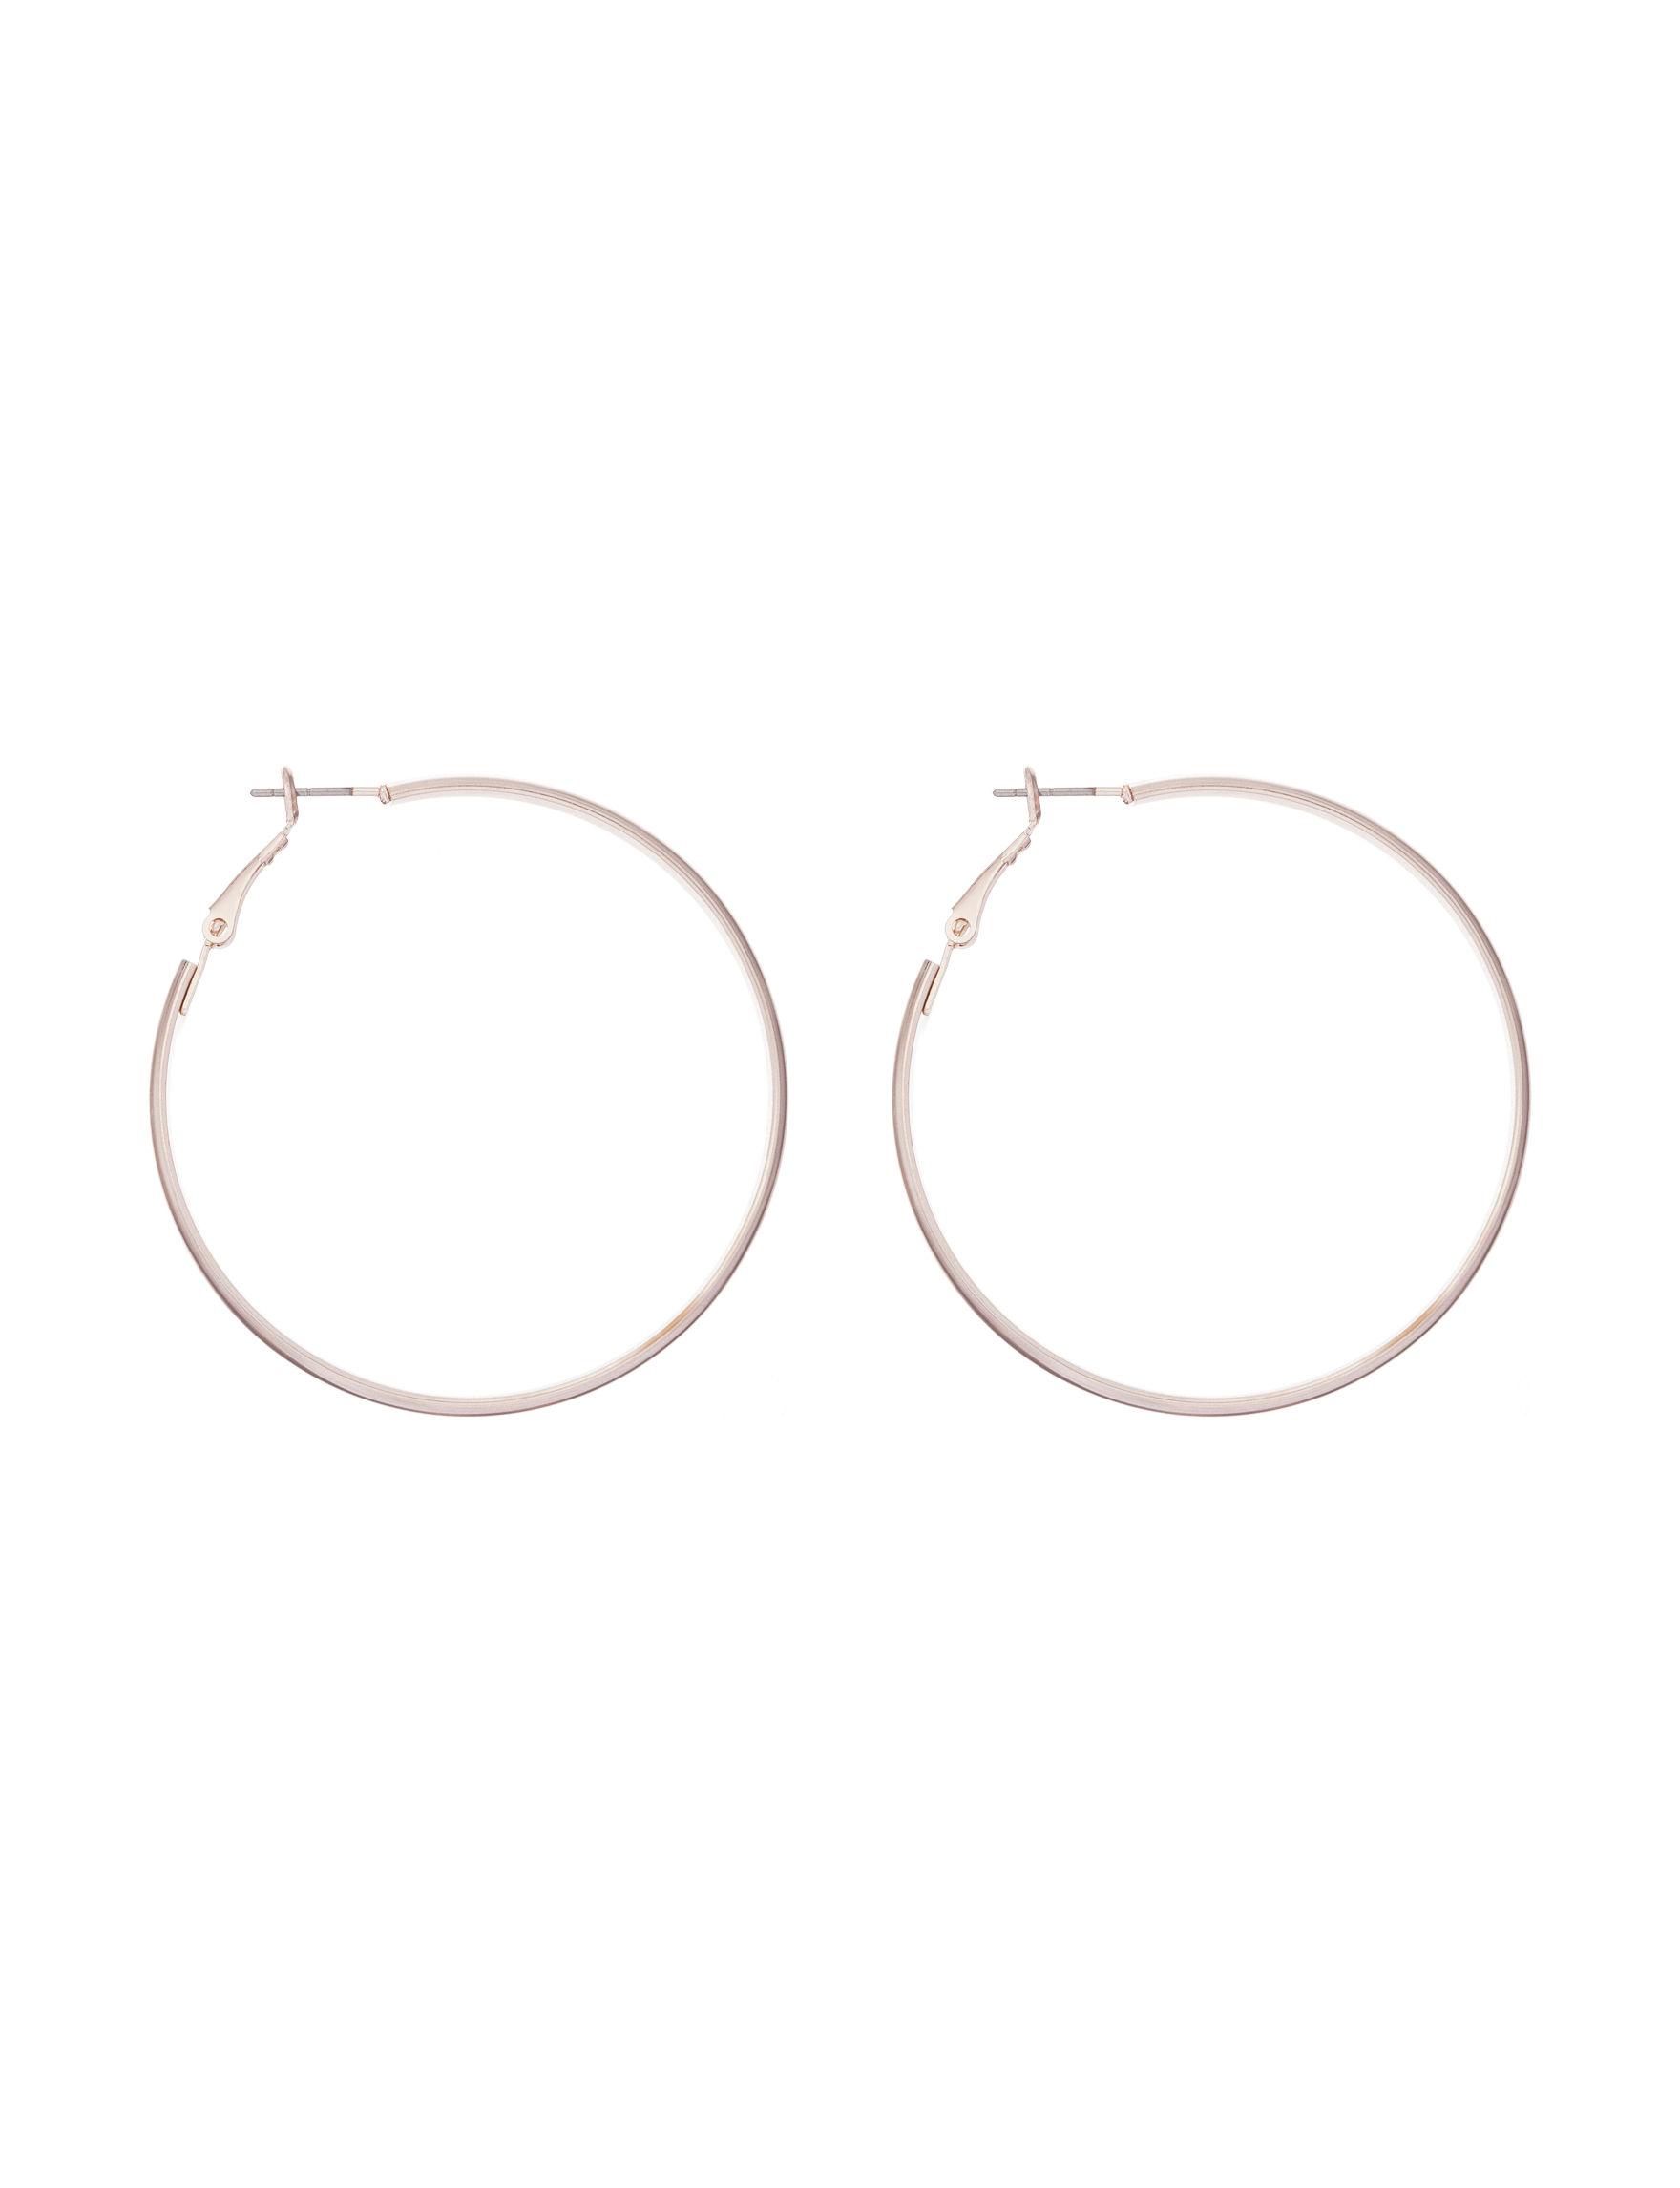 Hannah Rose Gold Hoops Earrings Fashion Jewelry